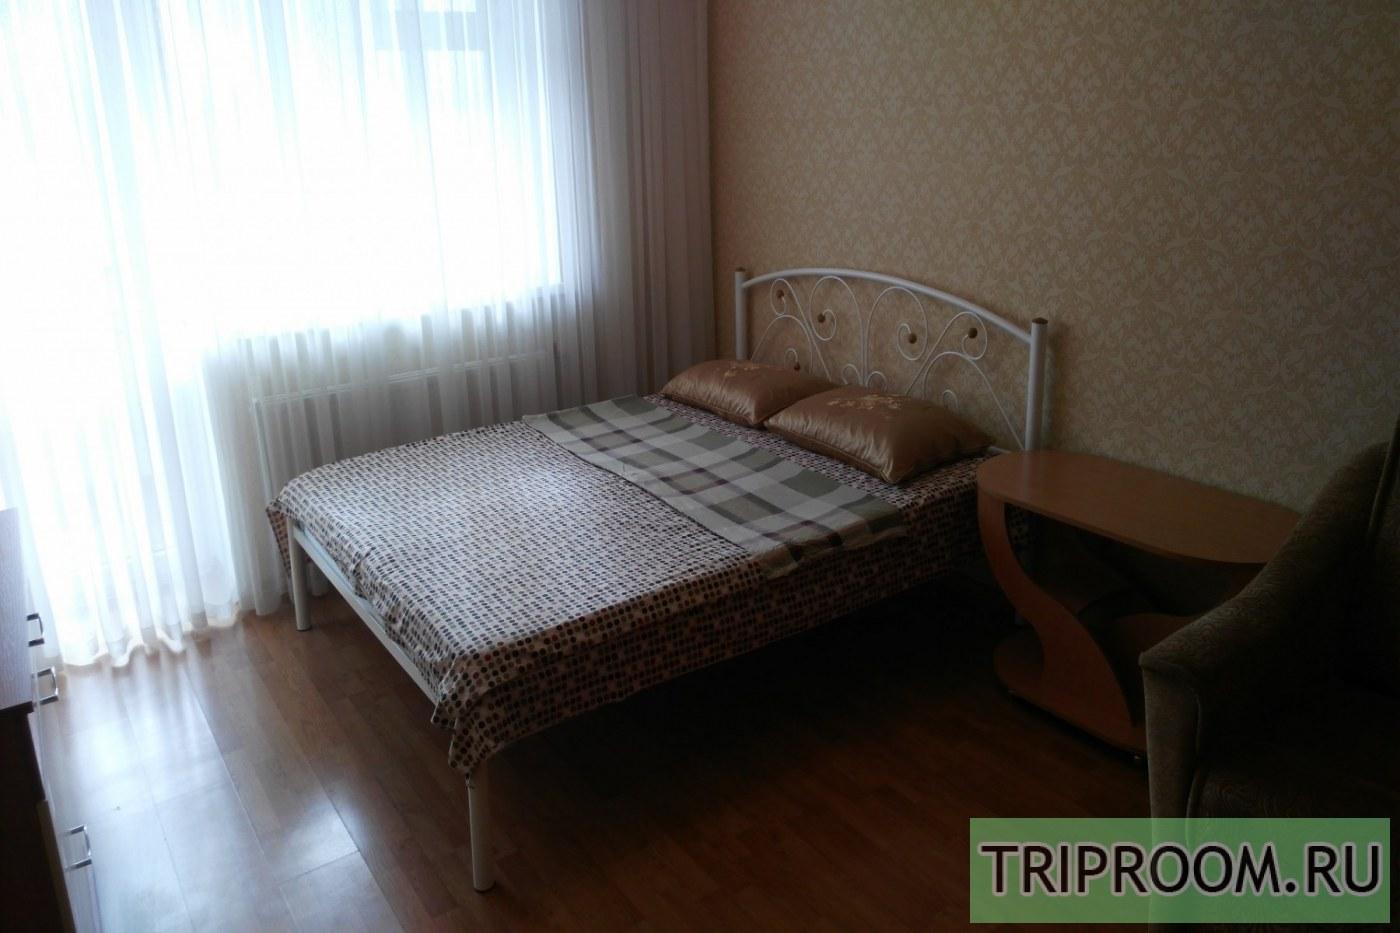 1-комнатная квартира посуточно (вариант № 38995), ул. Лексина улица, фото № 3